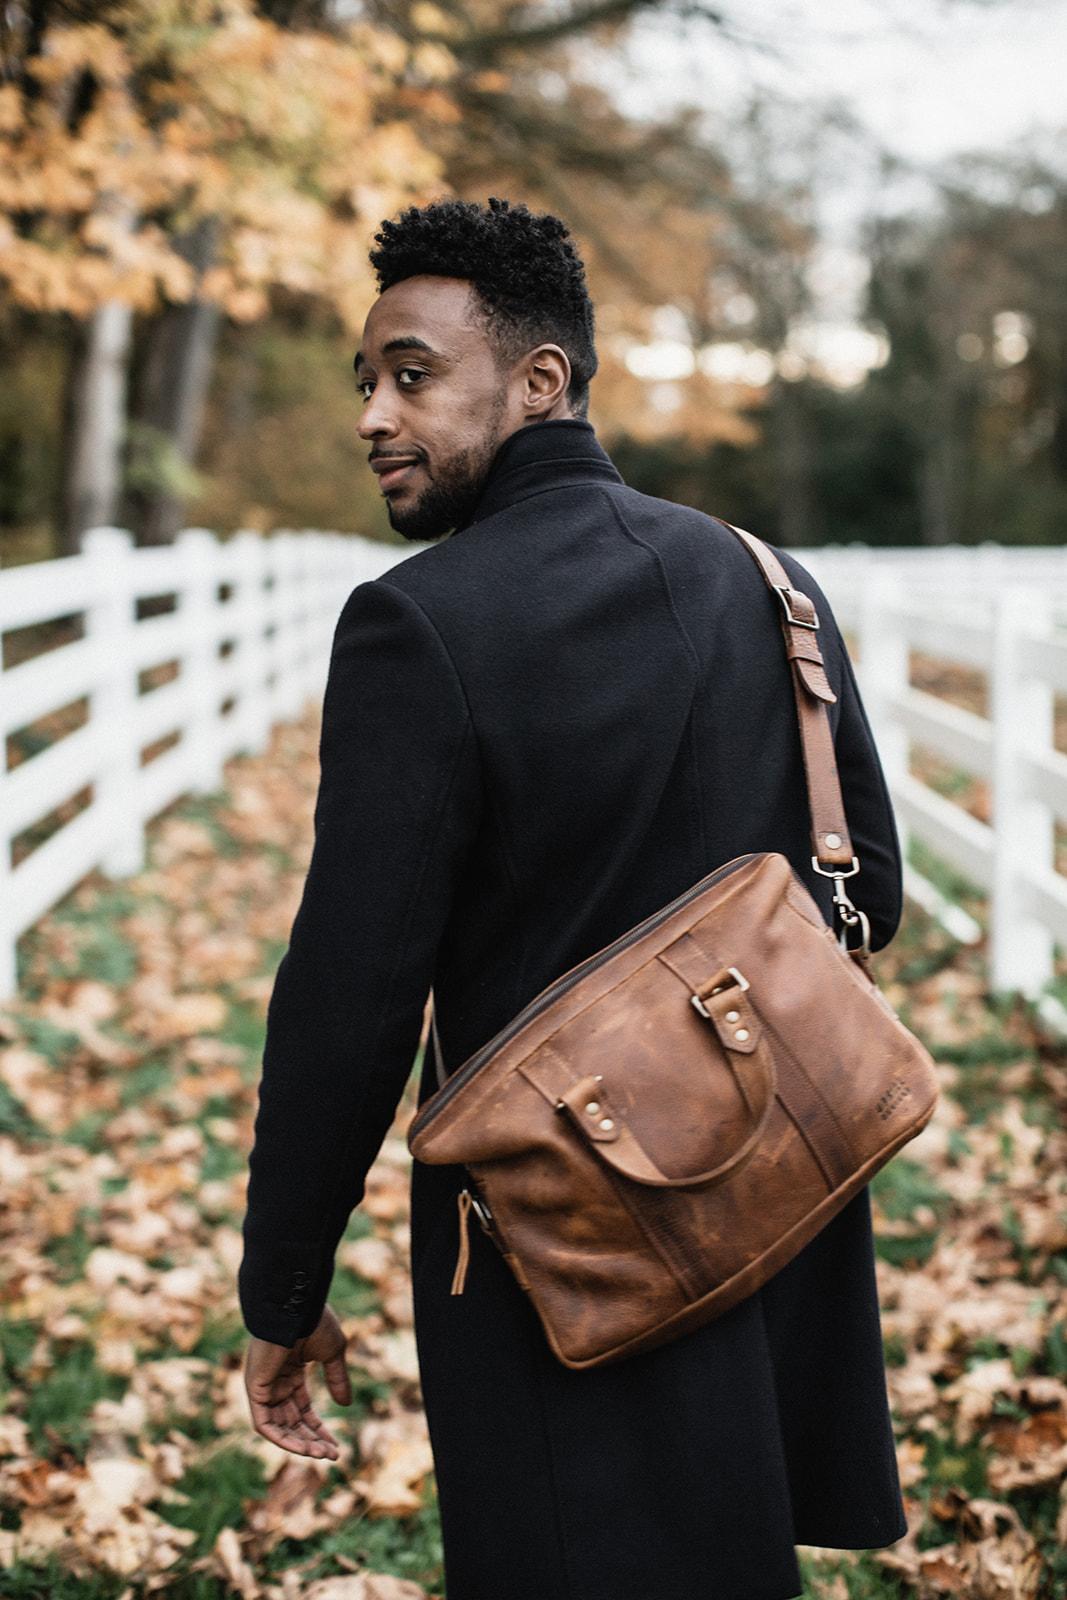 Uphill Designs - Appalachian leather messenger bag - caramel - in hands